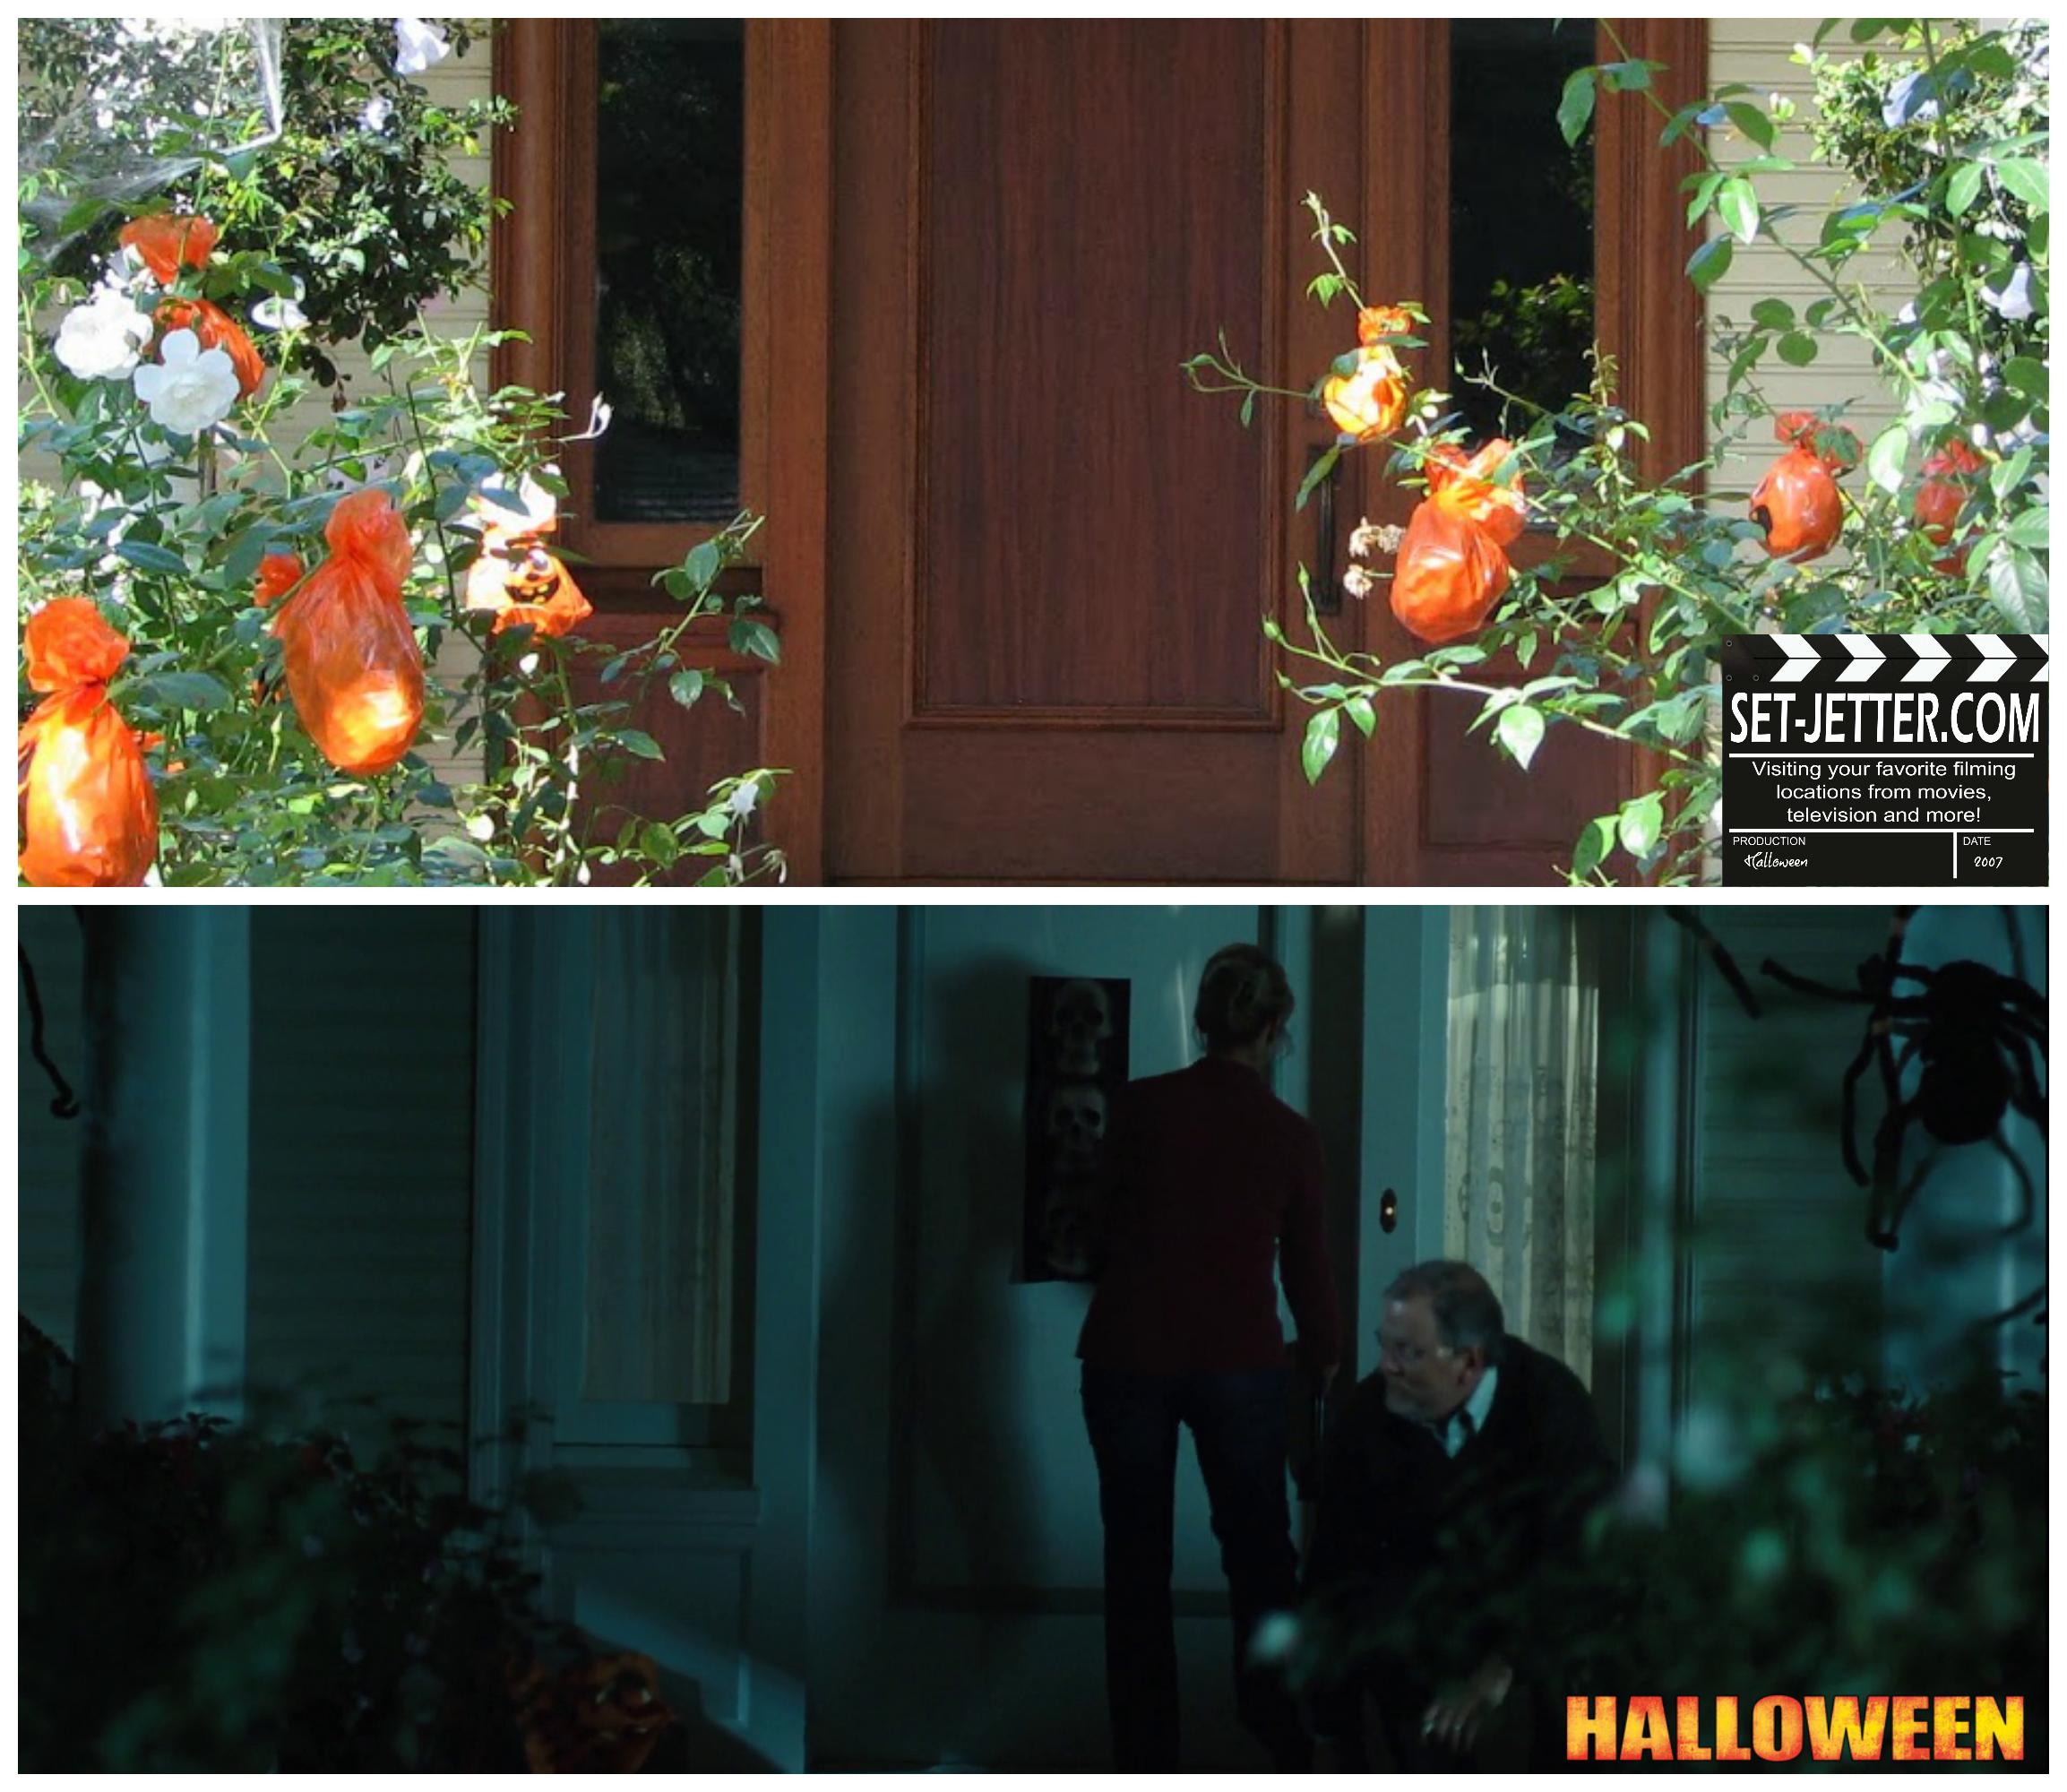 Halloween 2007 comparison 42.jpg